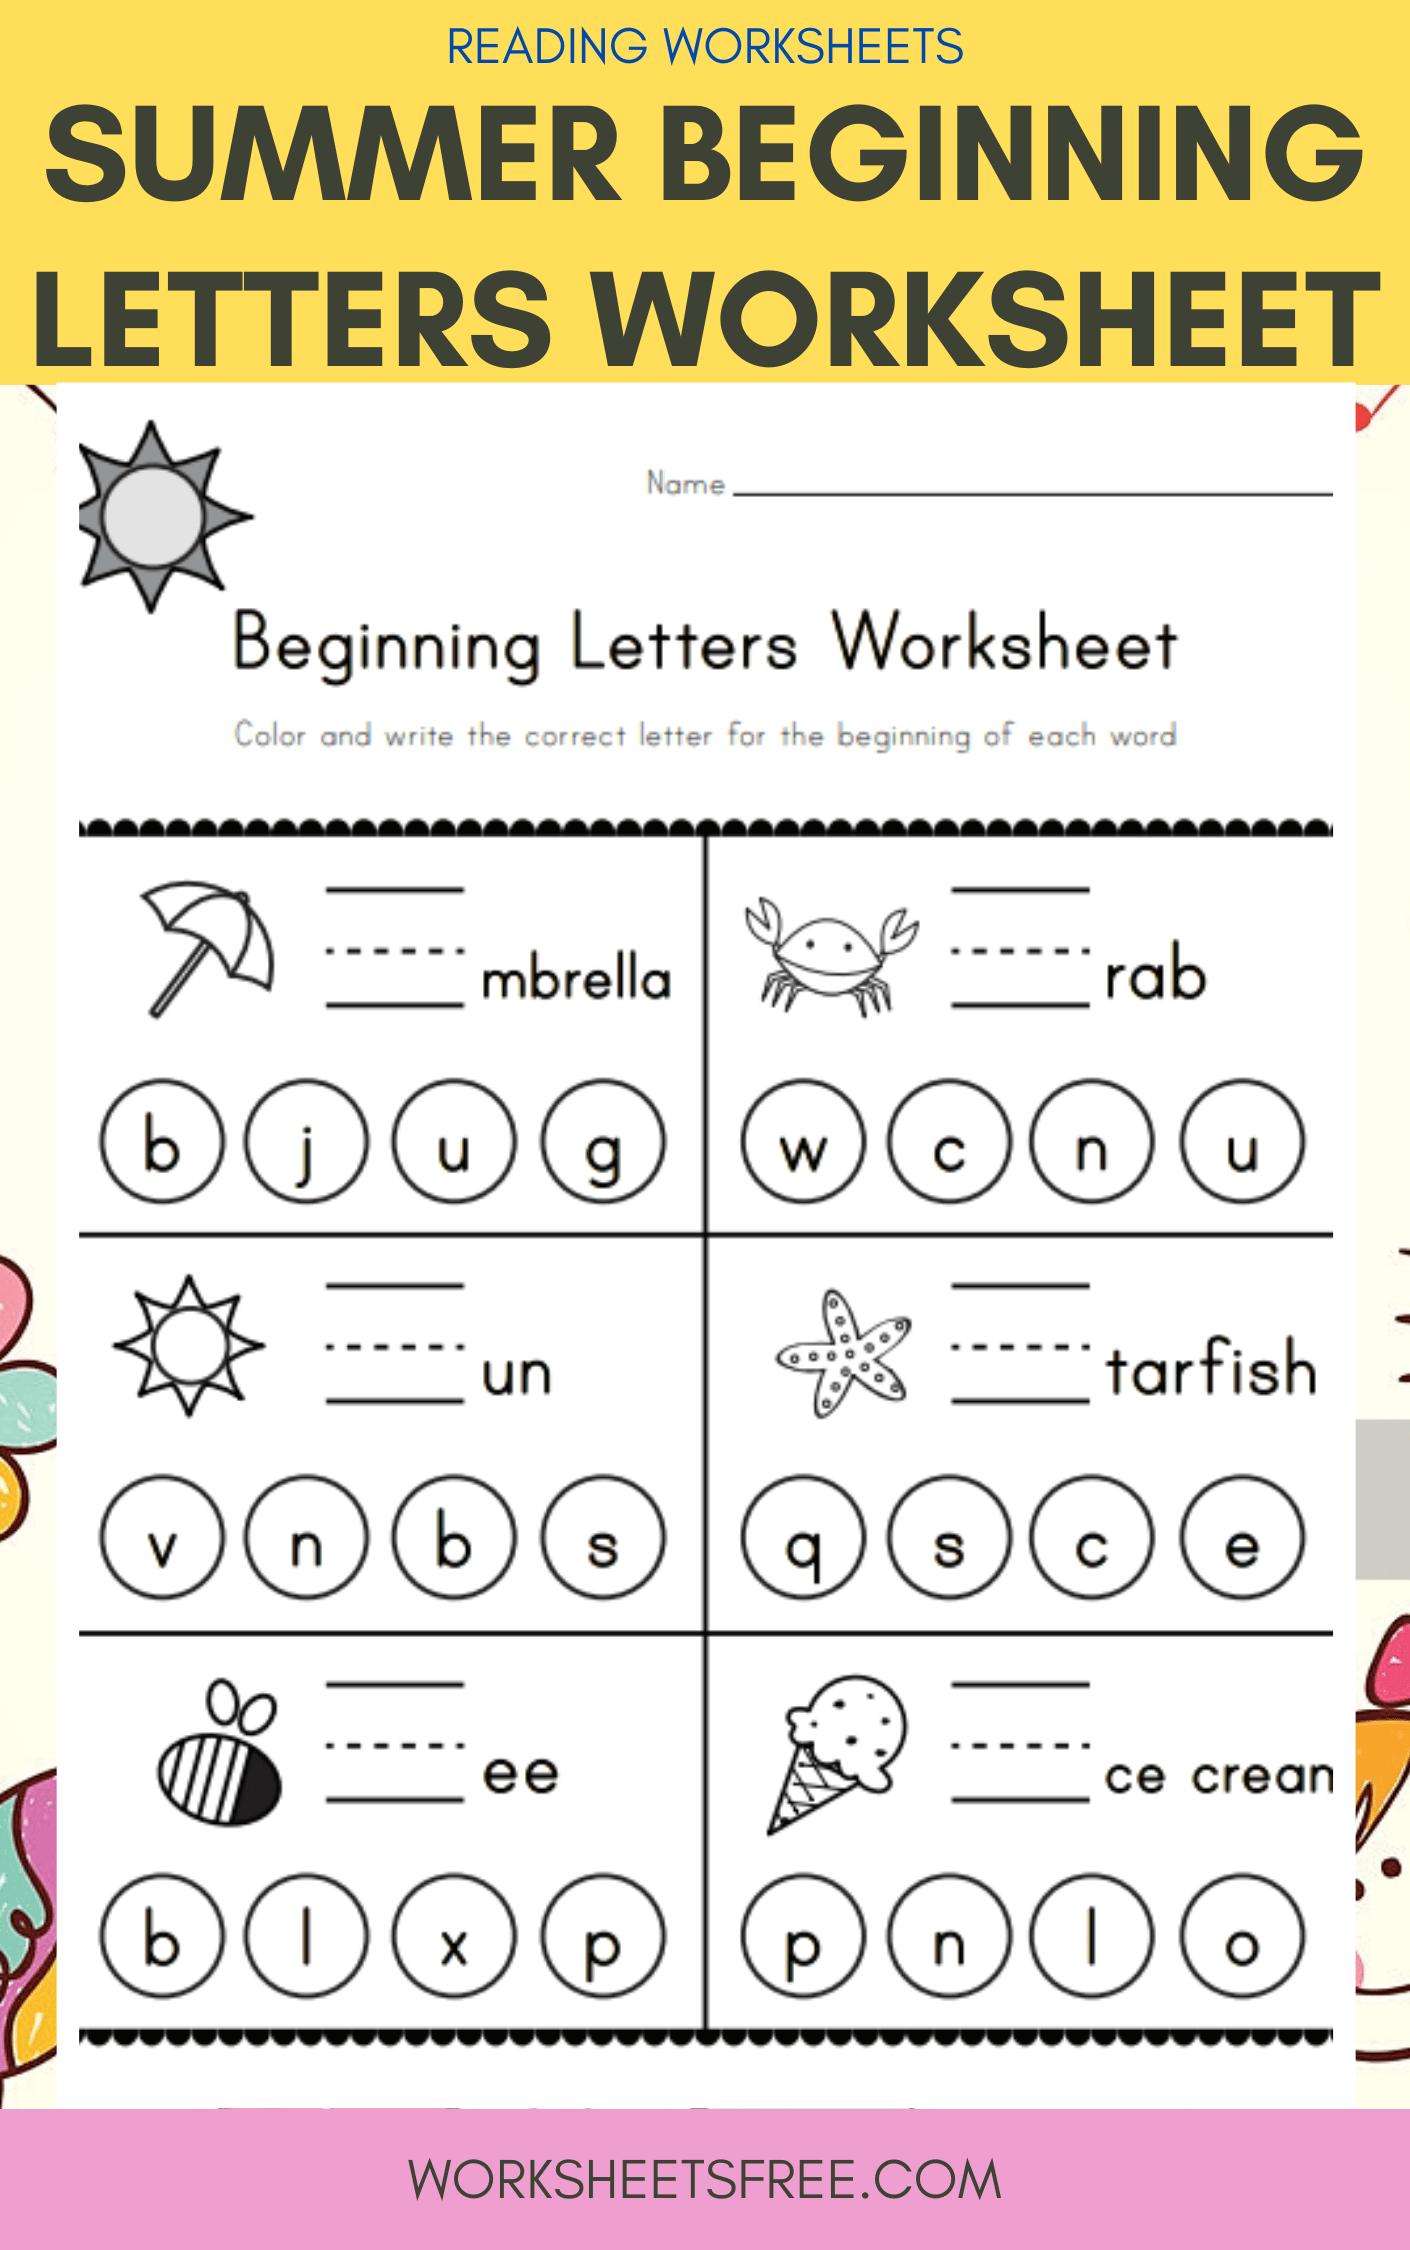 Summer Beginning Letters Worksheet